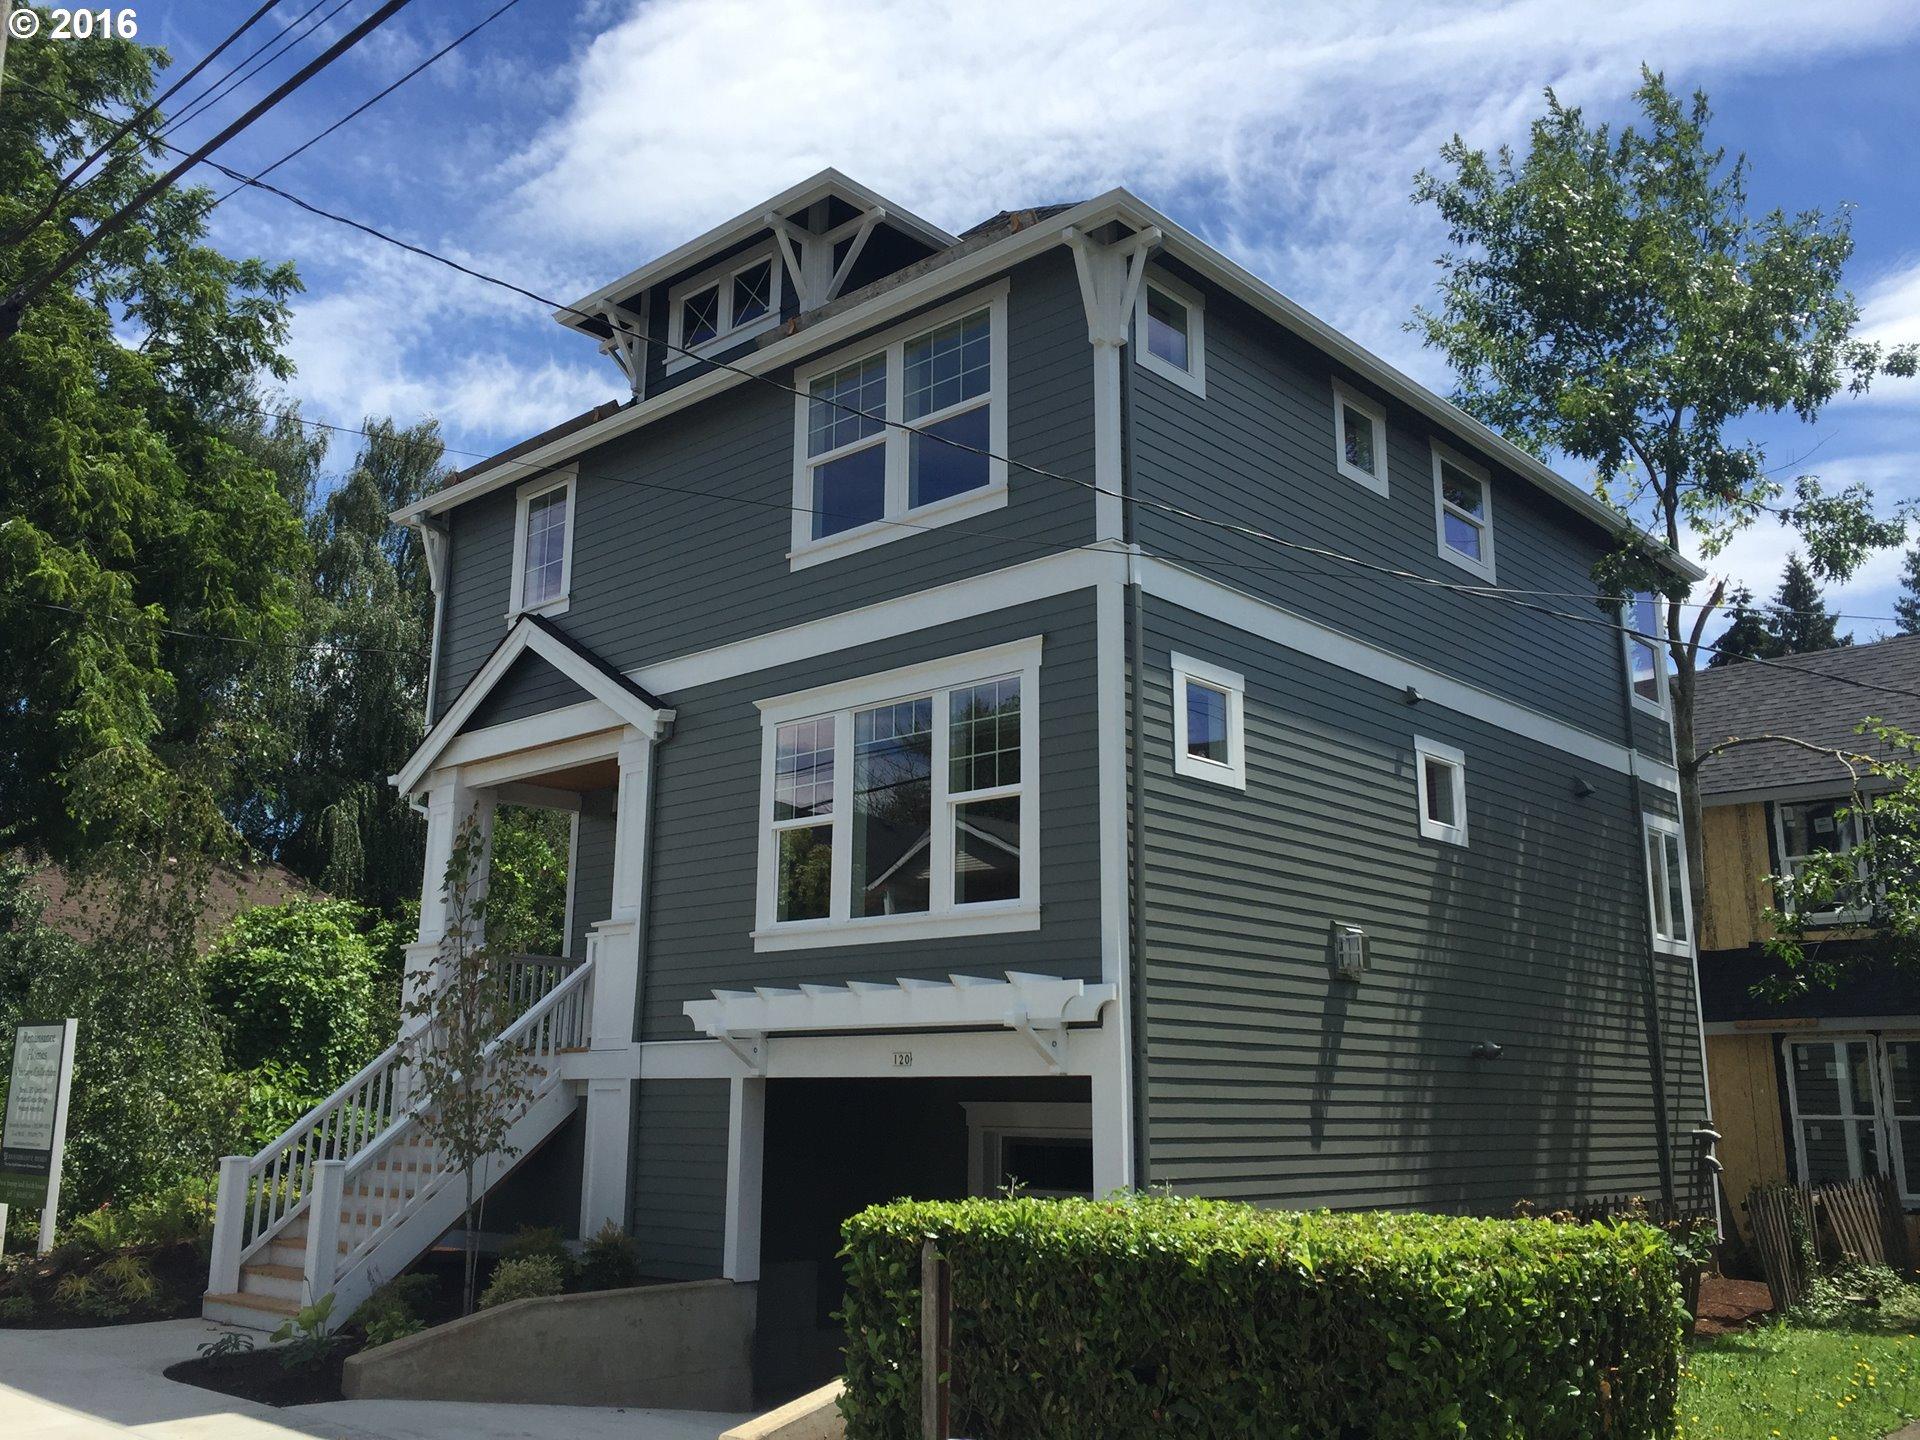 2143 N Kilpatrick, Portland, OR 97217